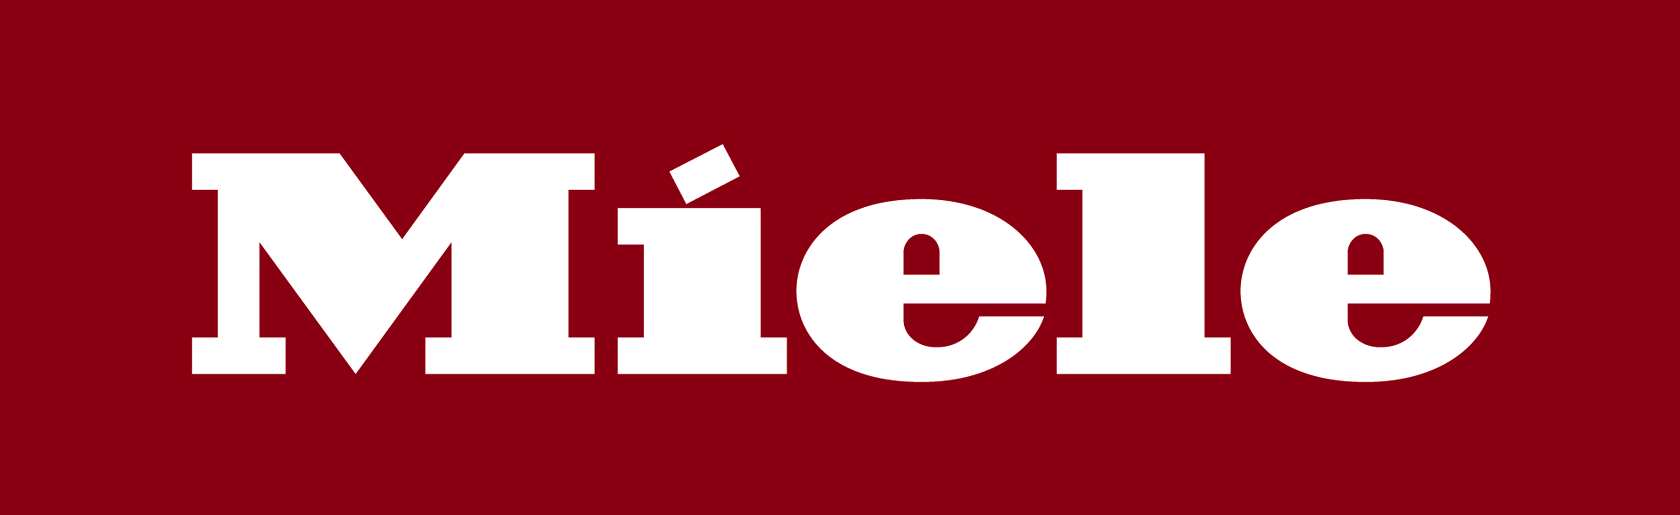 Группа компаний Мебельер